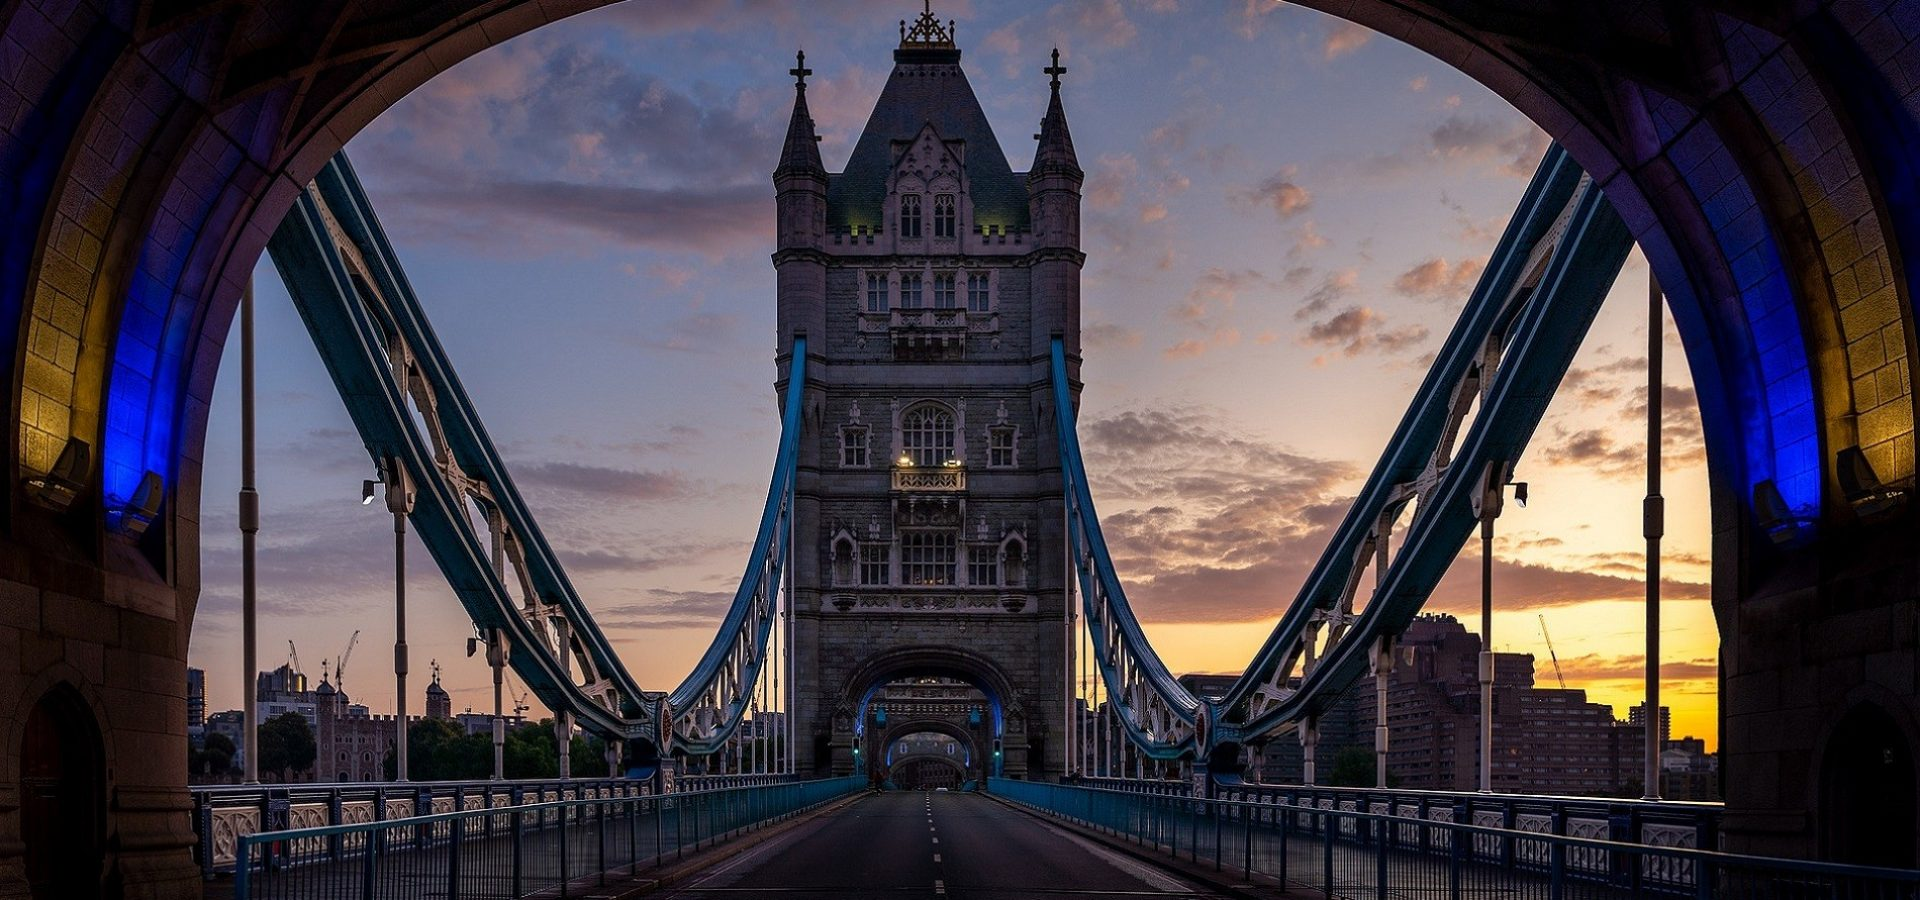 Tečaj engleskog jezika - Frances King School of English London